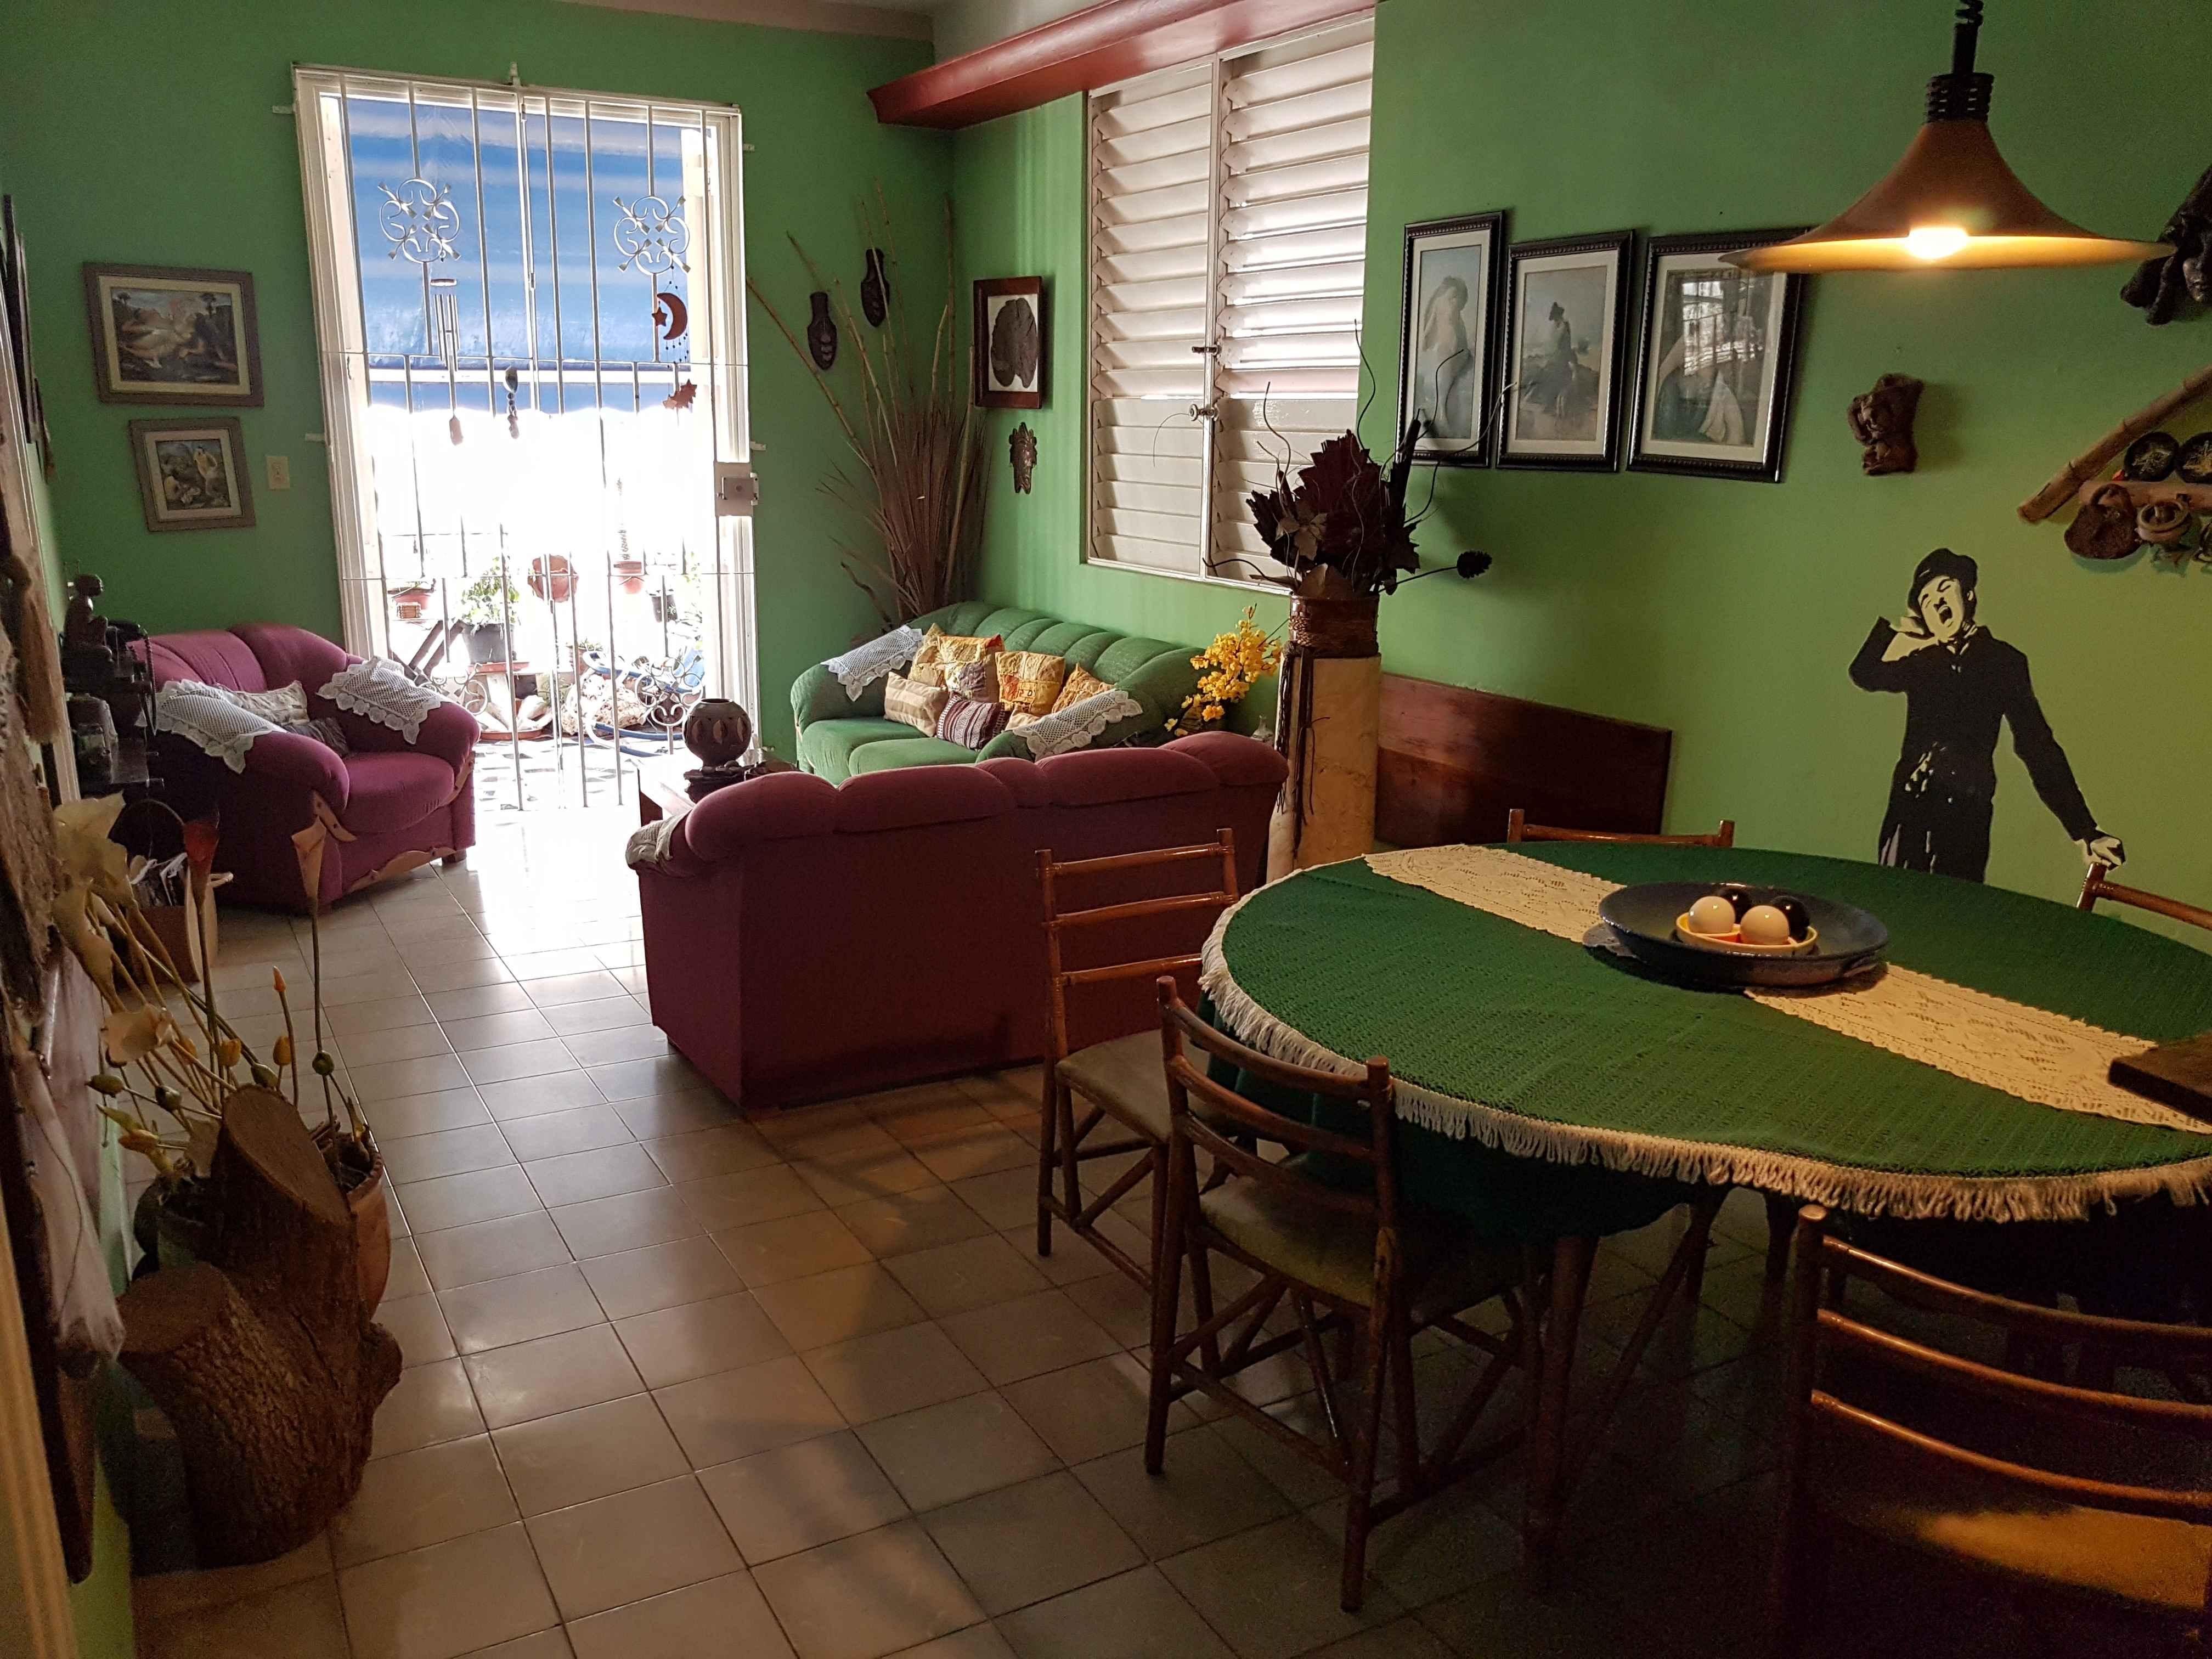 HAV208 - Hostal Peregrino Apartamento adjunto no.2